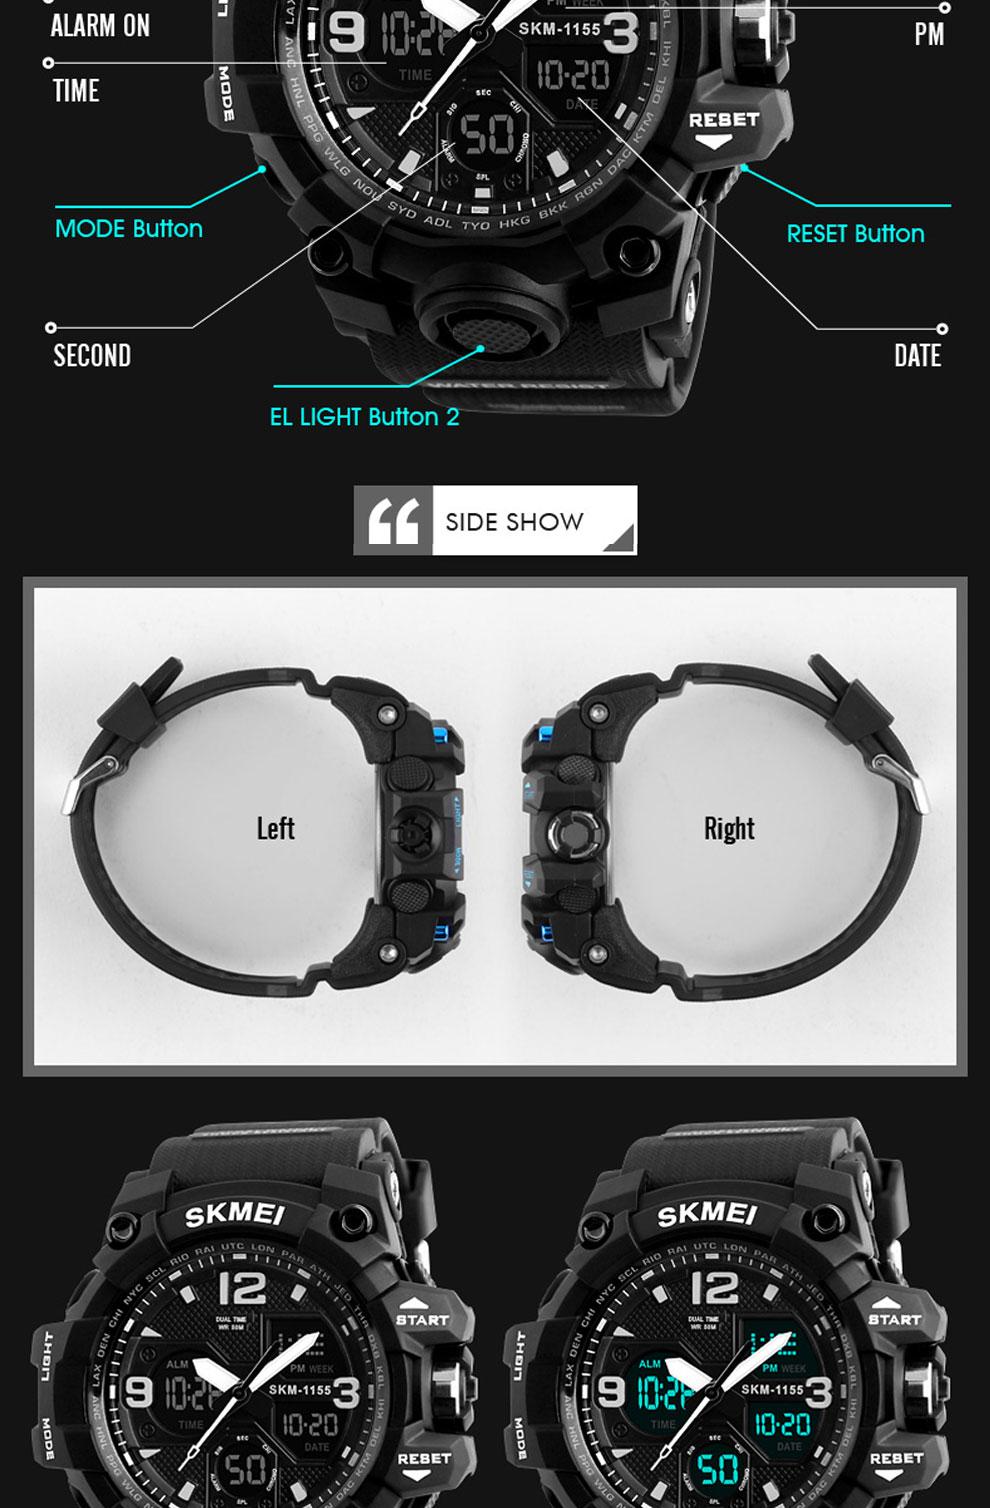 HTB1iaRlRCzqK1RjSZFLq6An2XXaB SKMEI Brand Luxury Military Sports Watches Men Quartz Analog LED Digital Clock Man Waterproof Dual Display Wristwatches Relogio